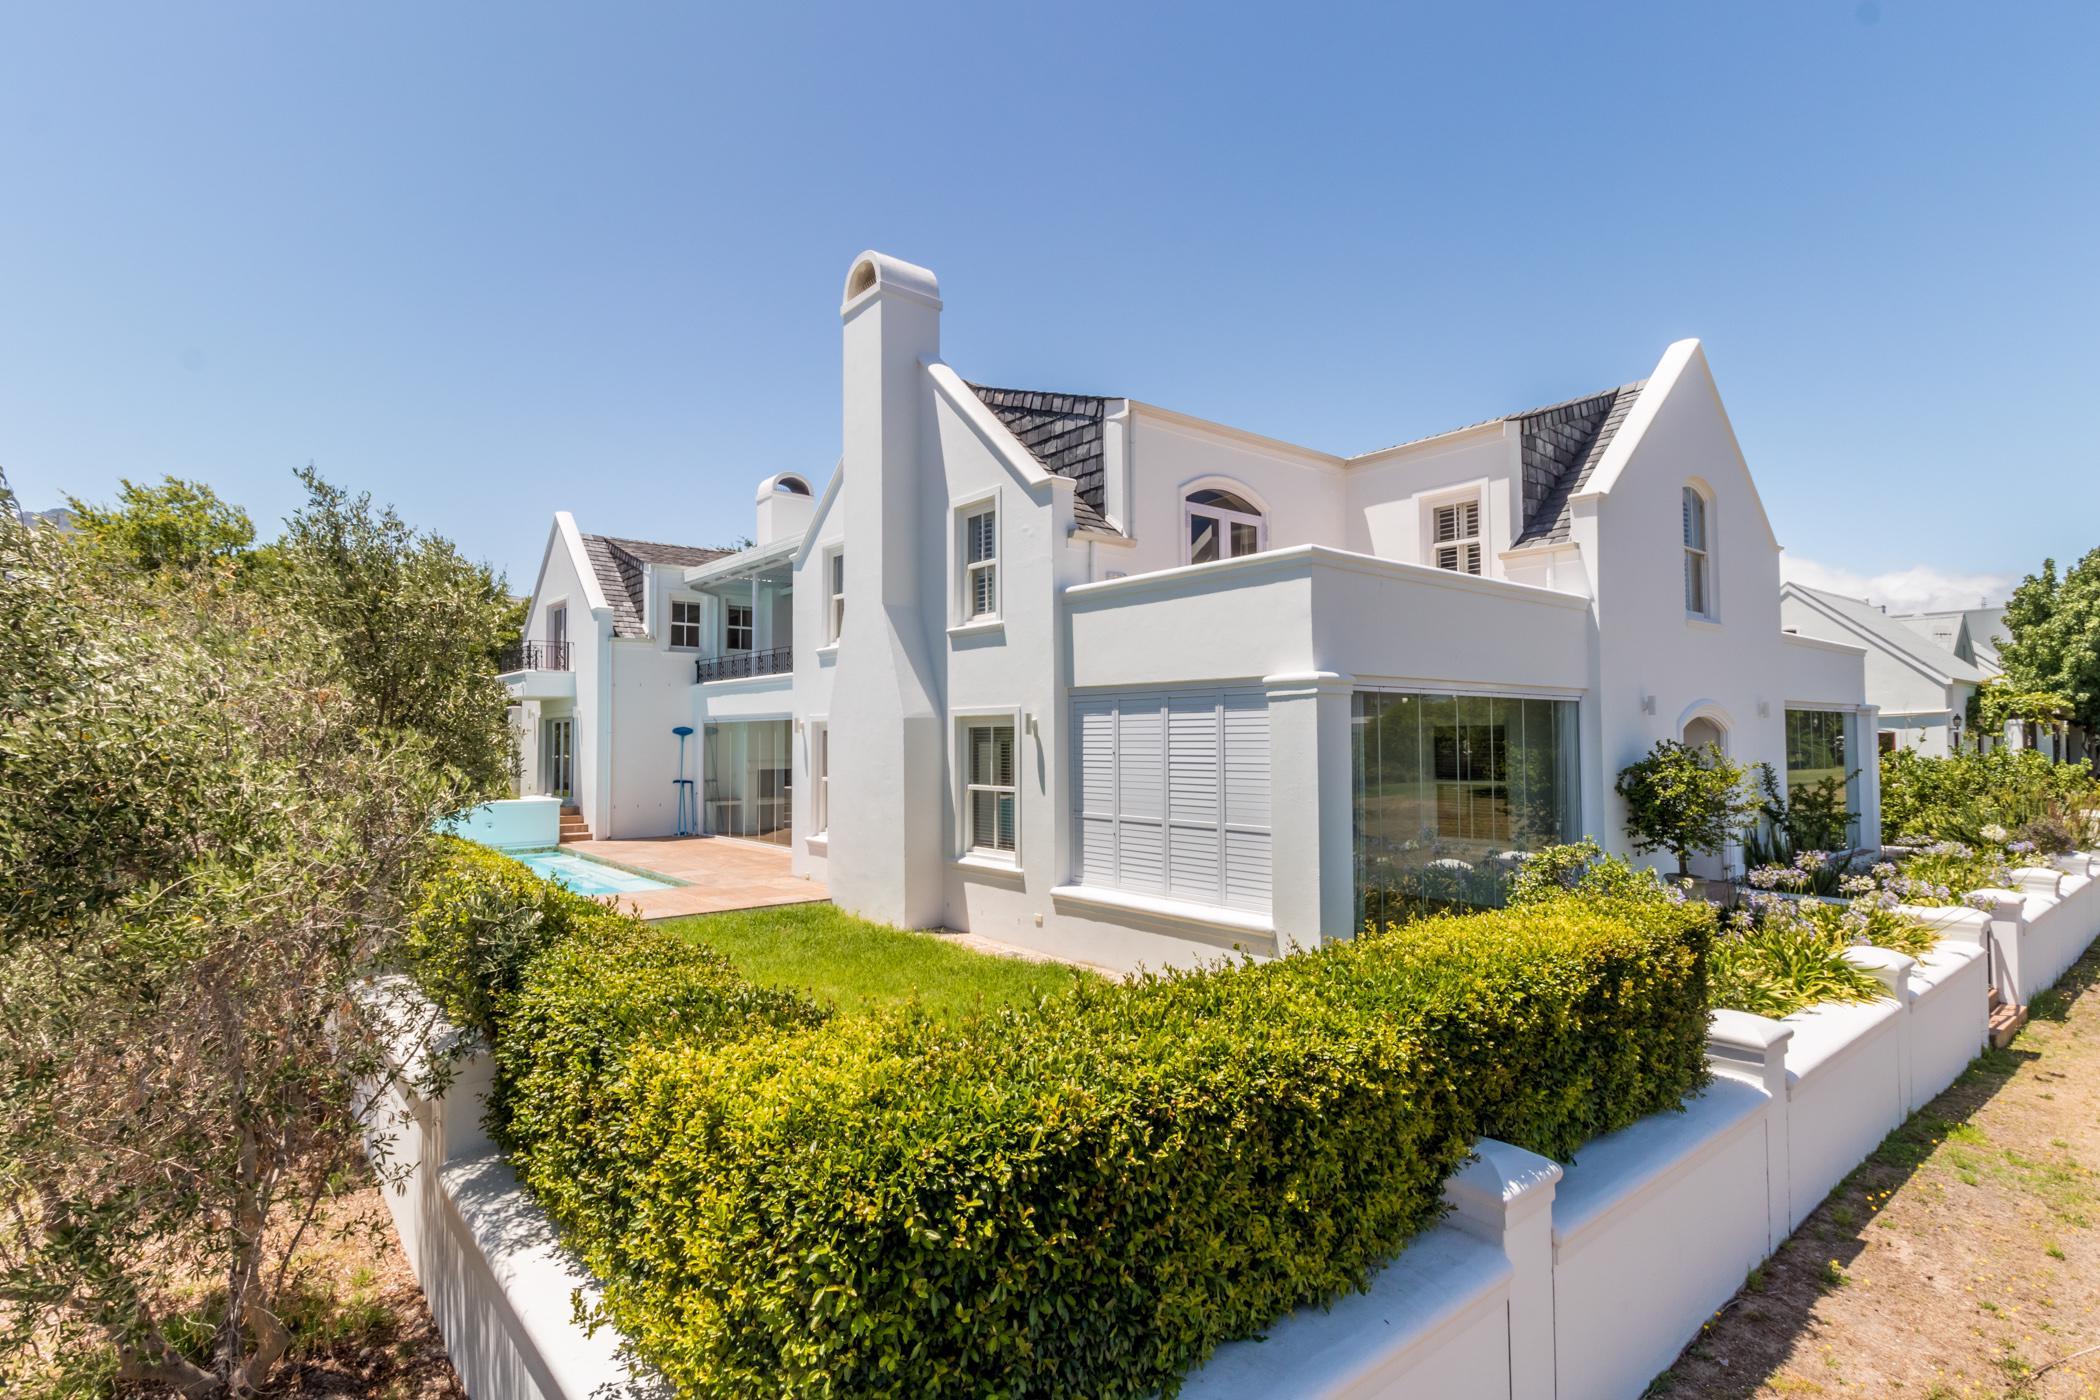 5 bedroom house for sale in De Zalze Winelands Golf Estate